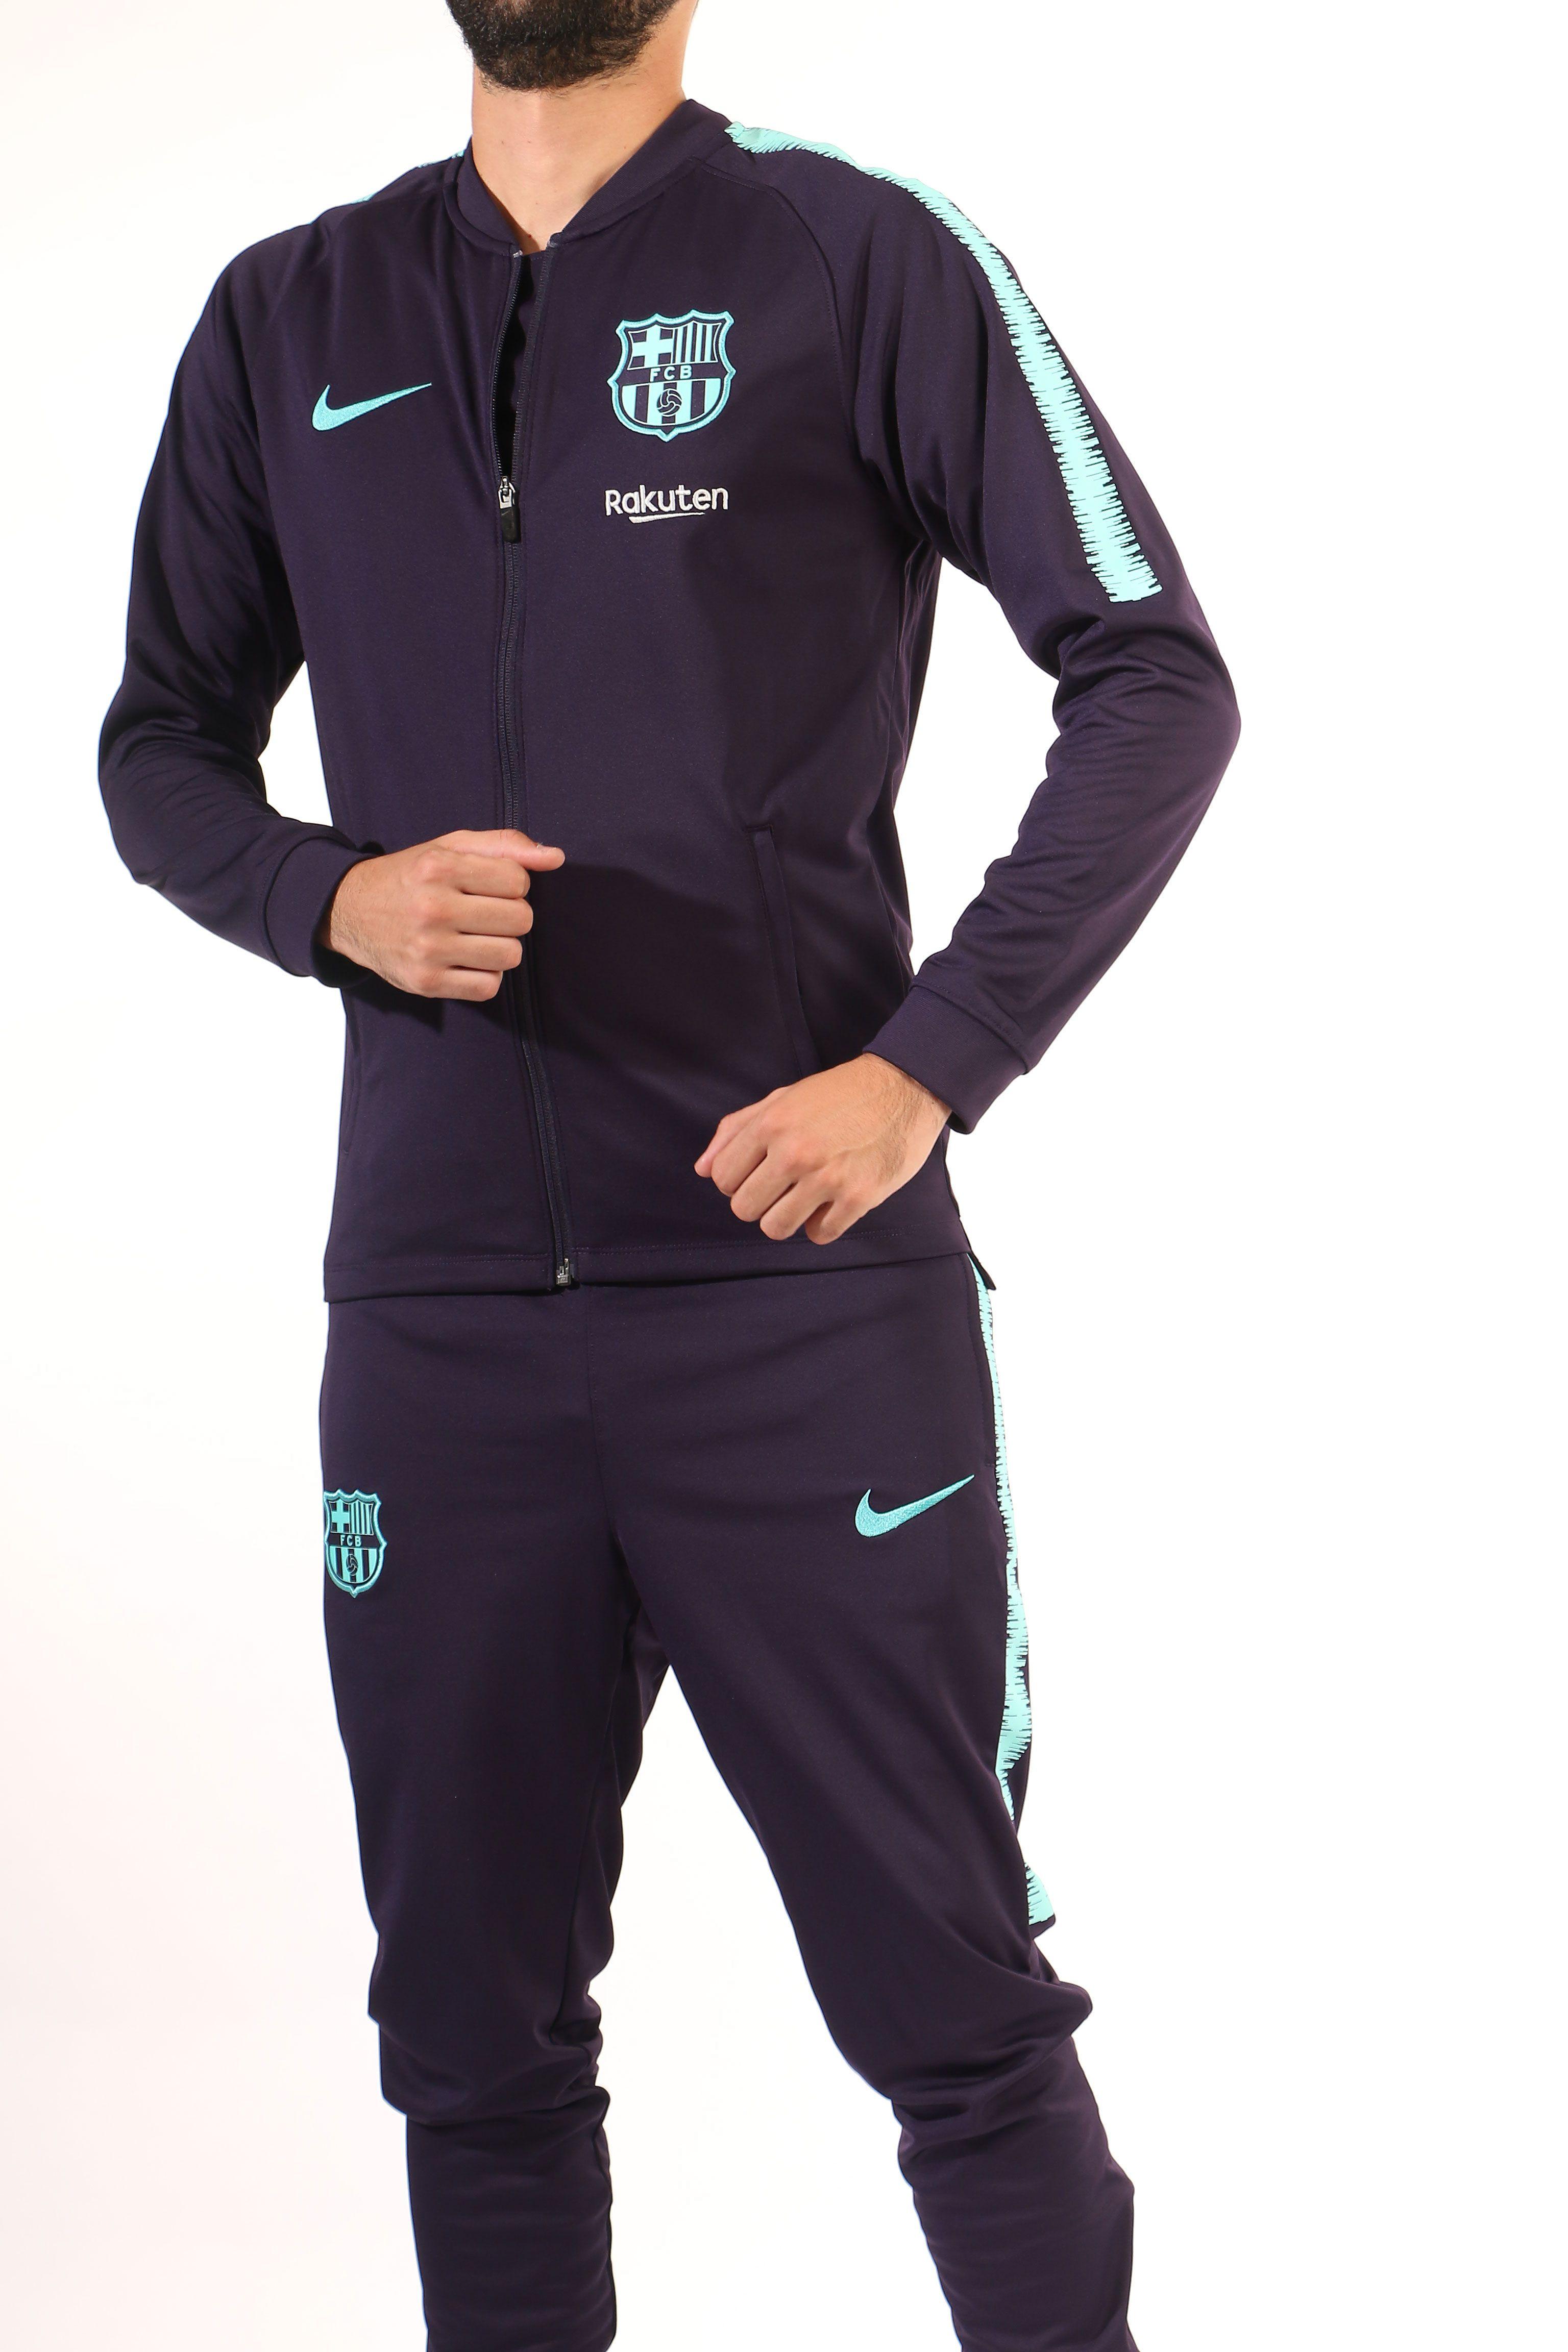 Chándal de paseo Nike del FC Barcelona 2018 - 2019 - morado 95abfd7cd84